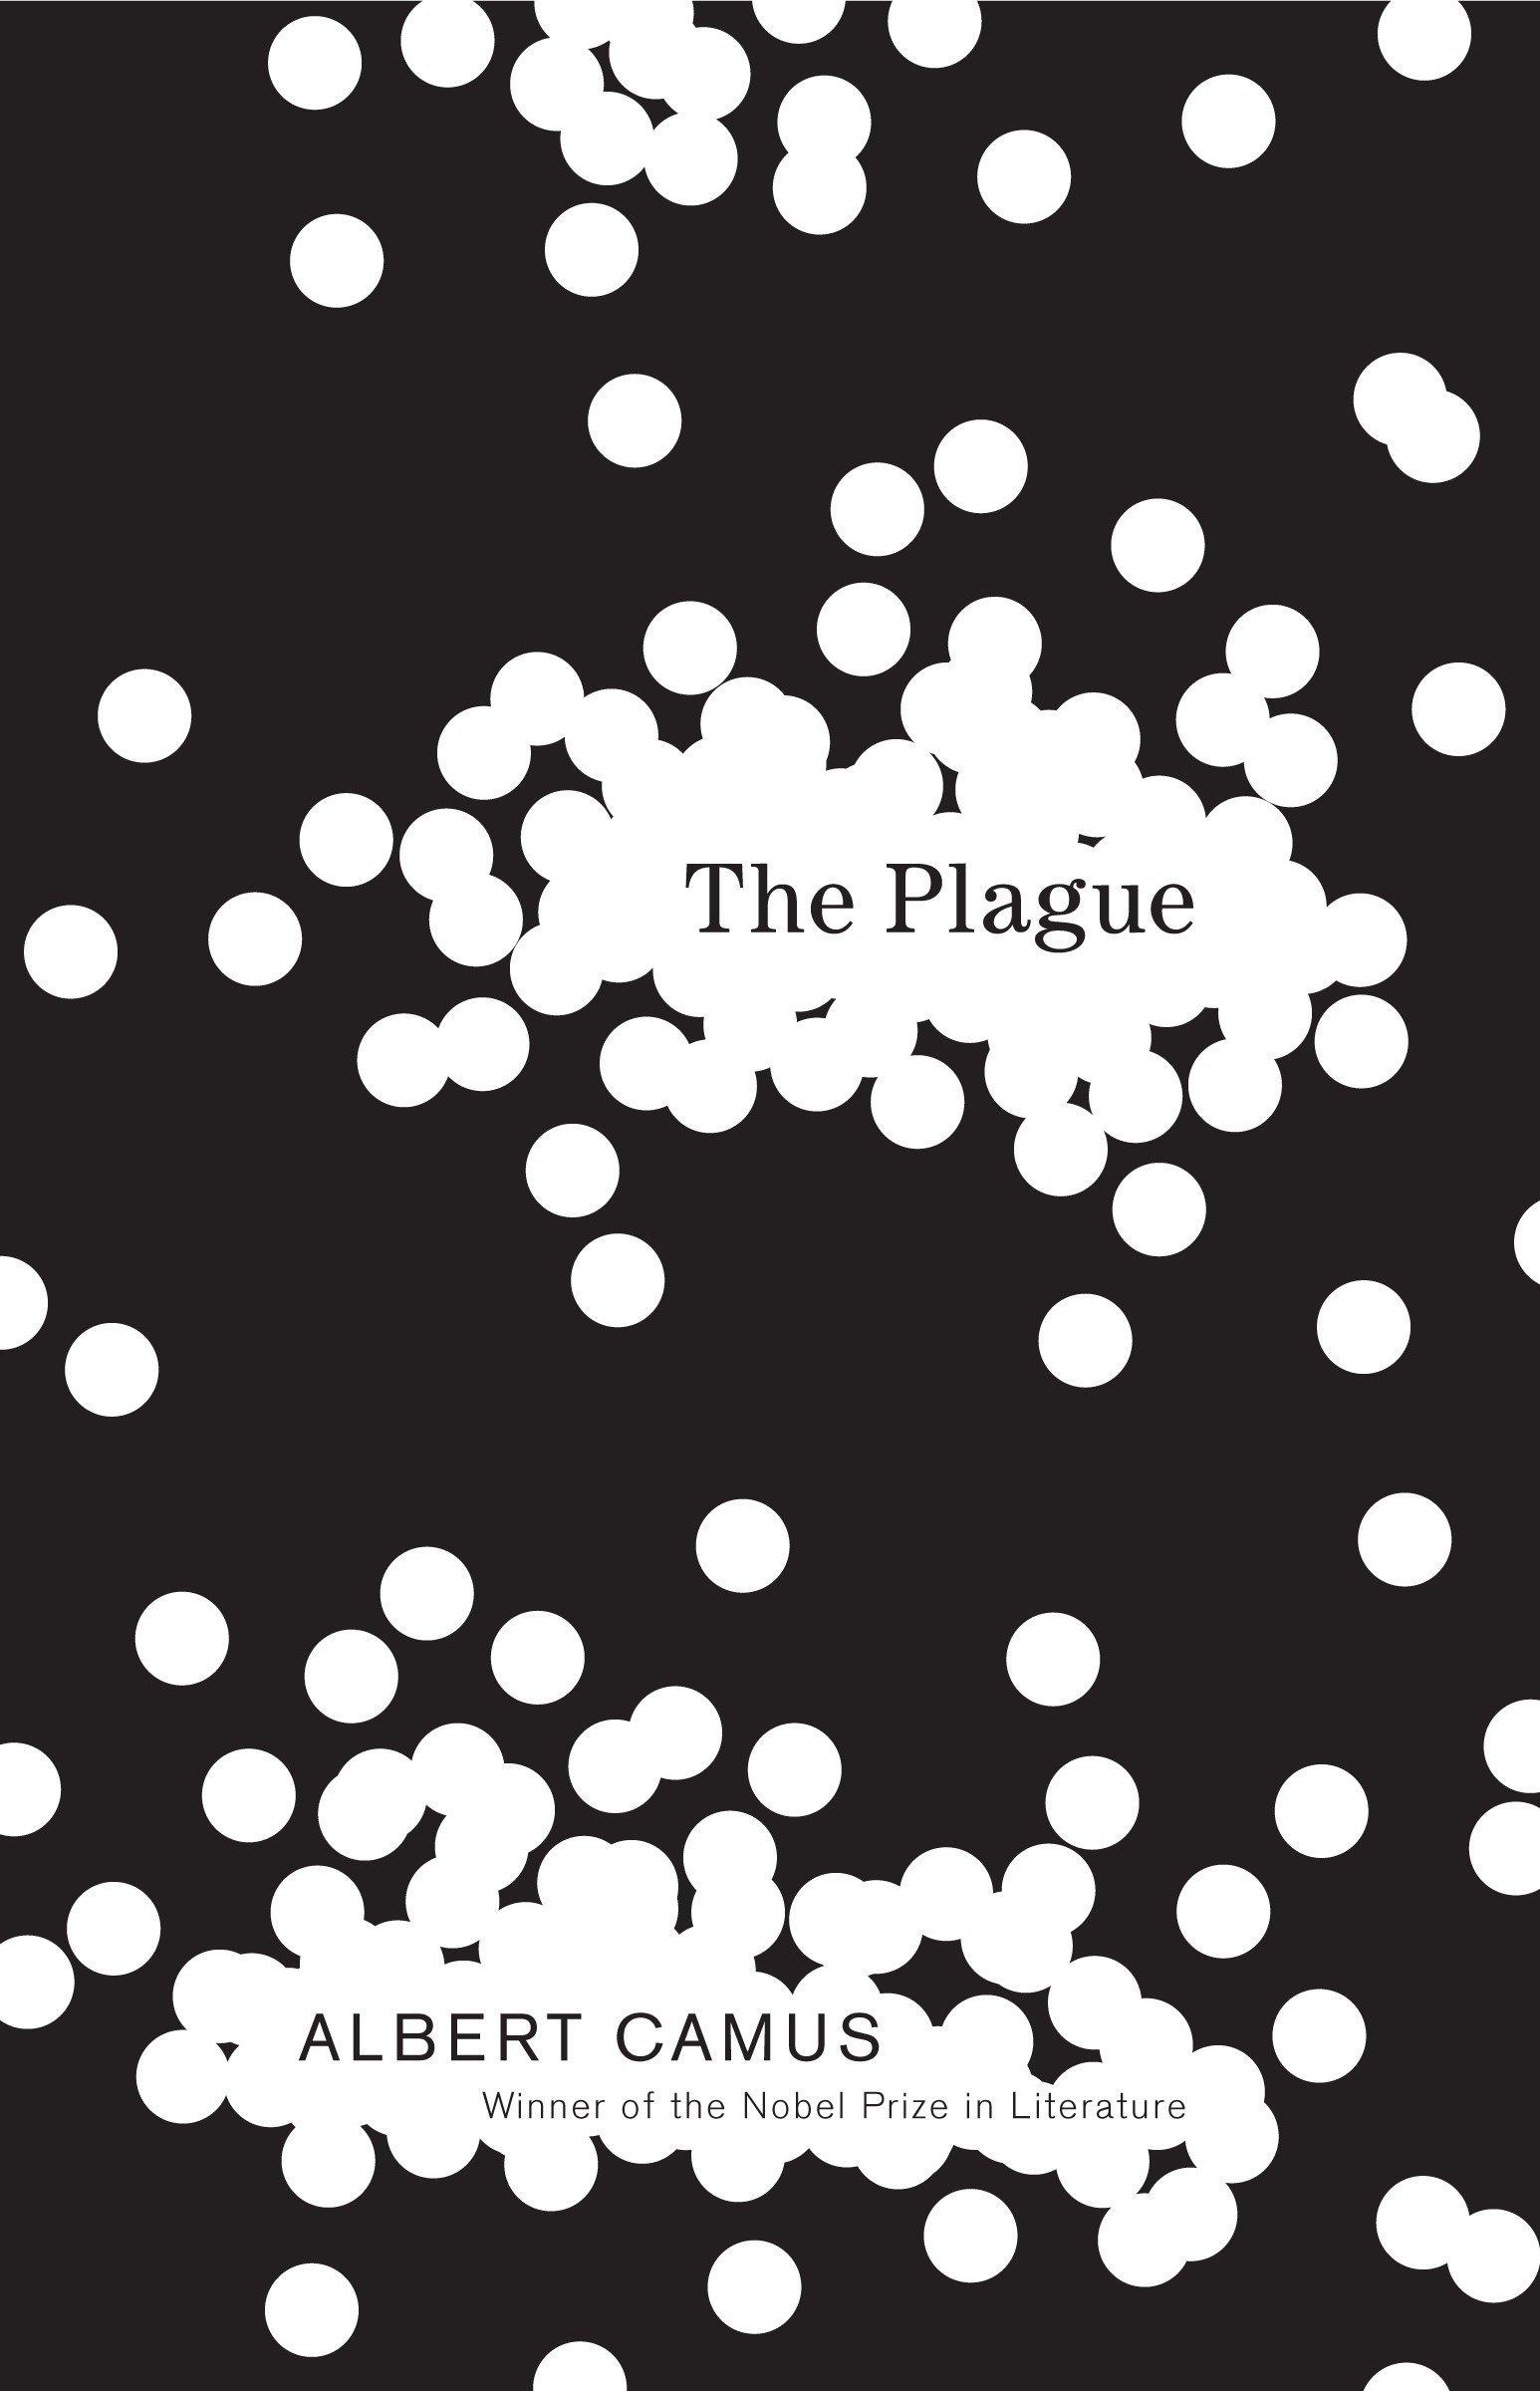 Amazon.com: The Plague (9780679720218): Albert Camus, Stuart ...